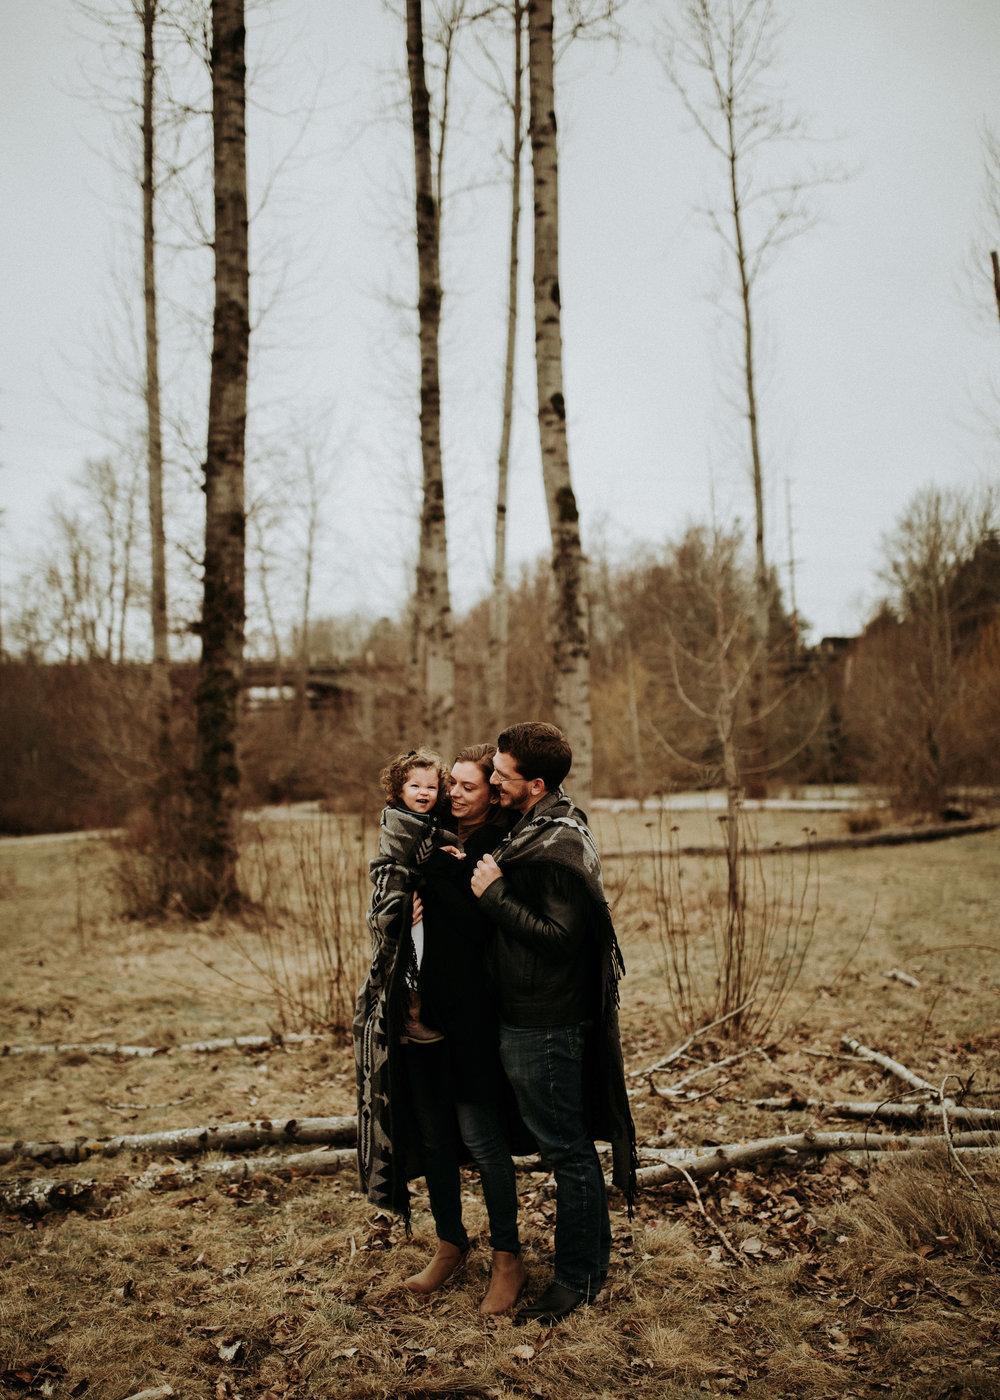 Family-Photographer-Bellingham-WA-Brianne-Bell-Photograpy-(Anya)-55.jpg